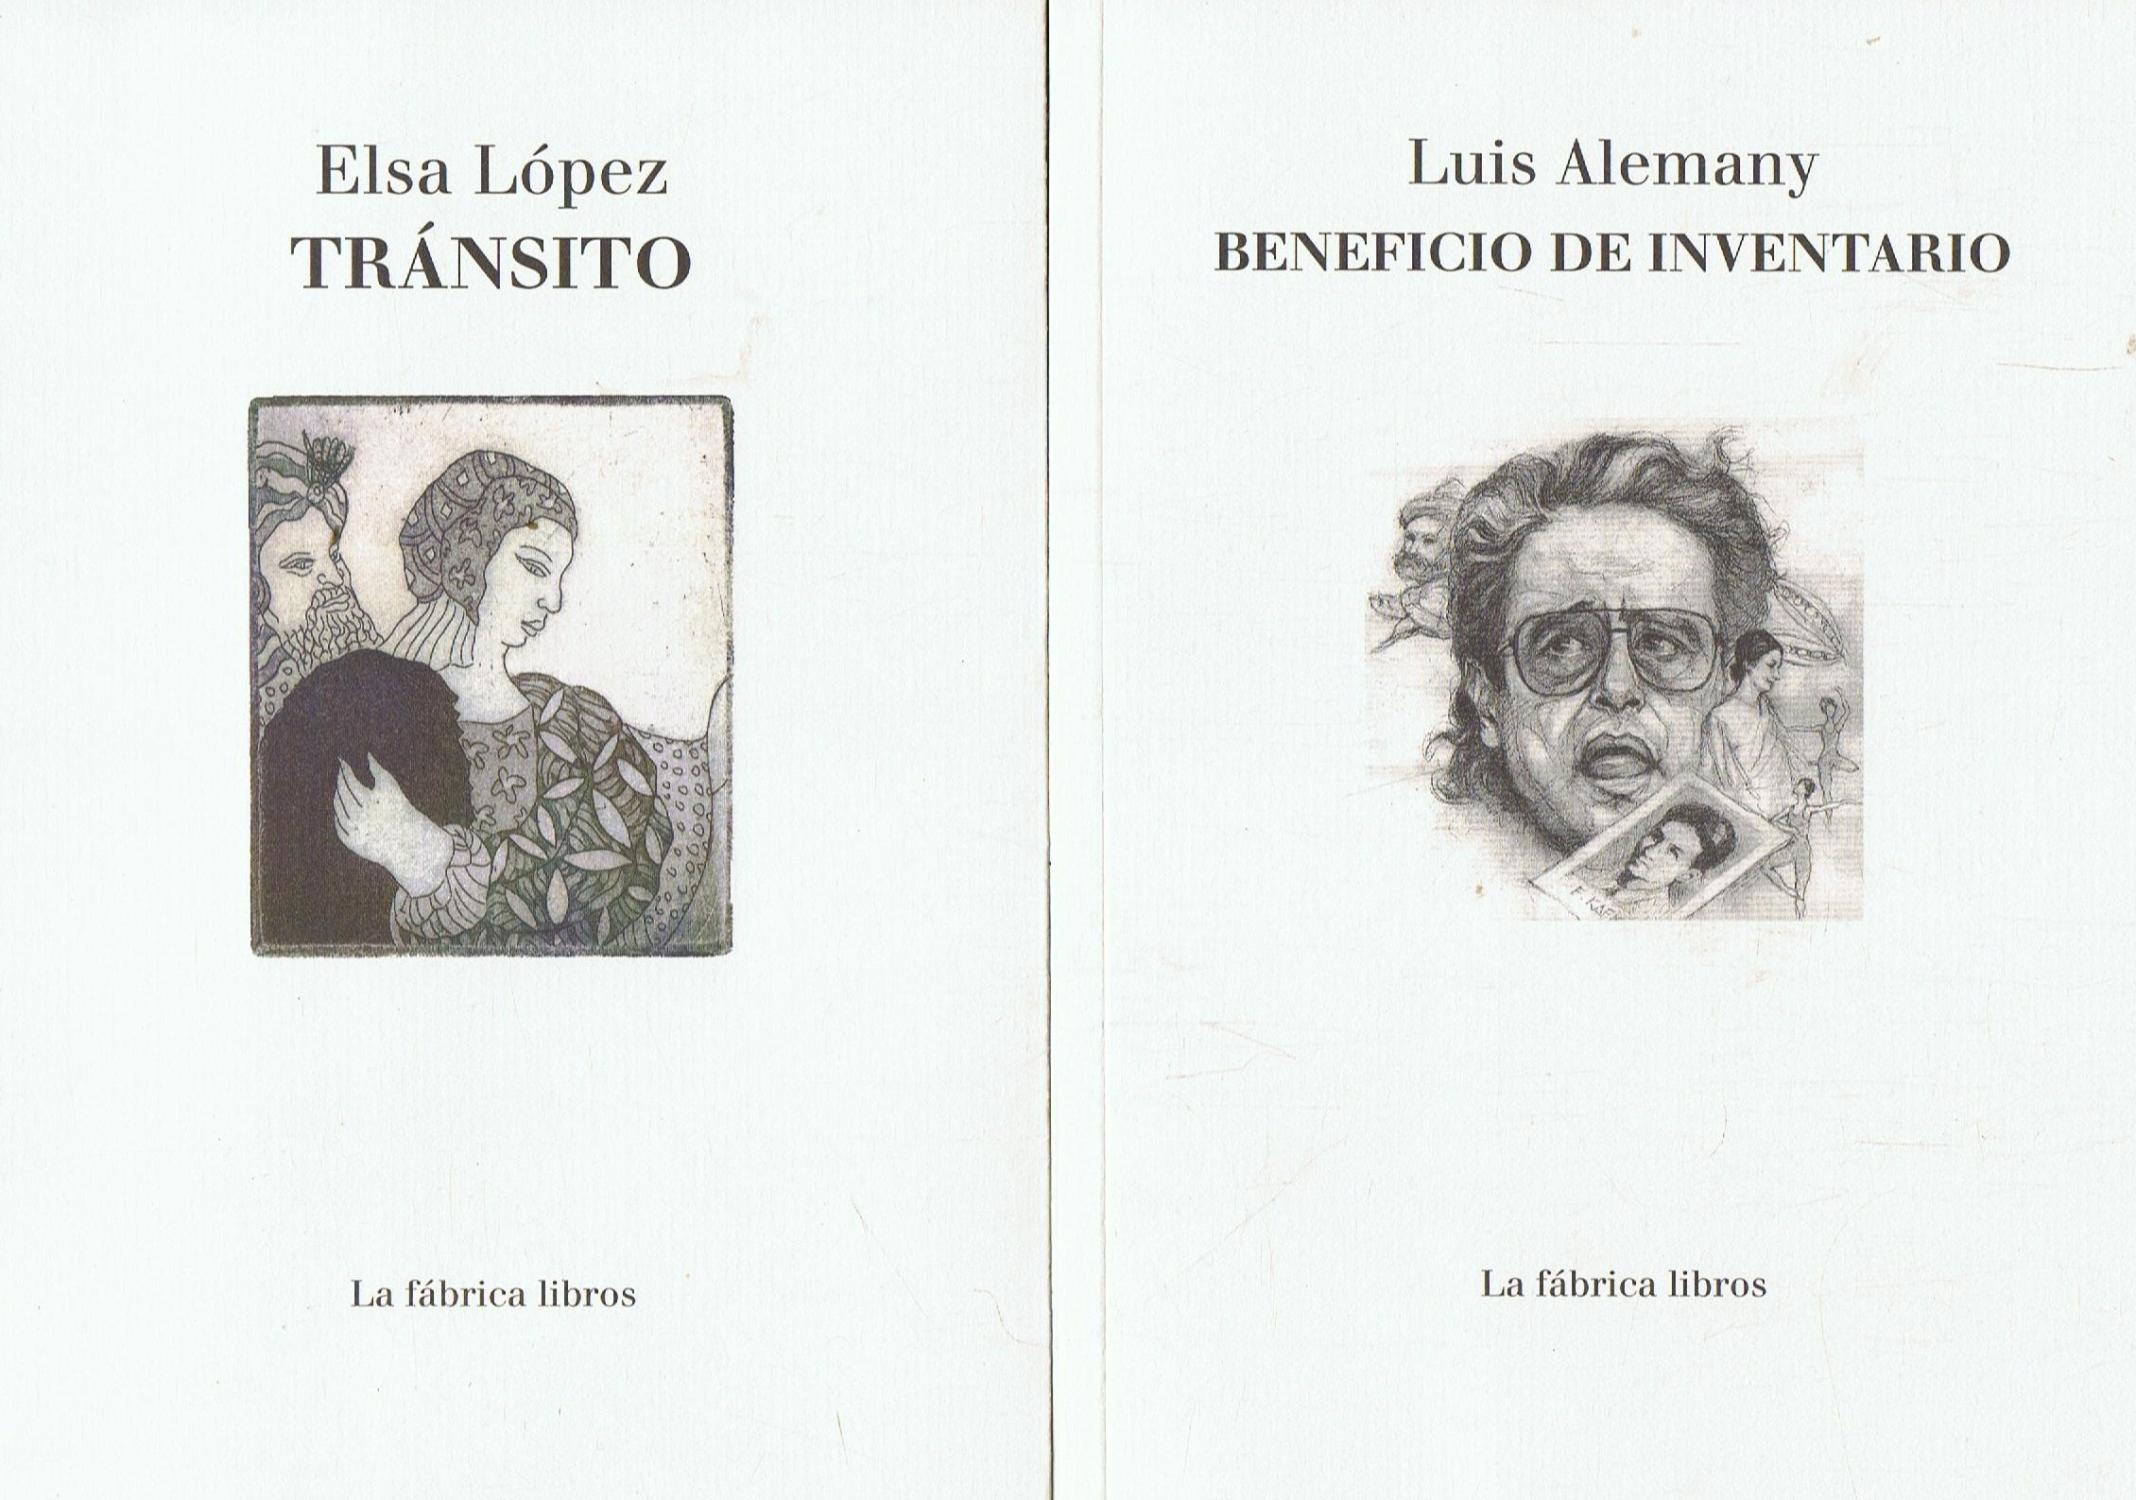 LA FÁBRICA. Miscelánea de arte y Literatura. nº 1